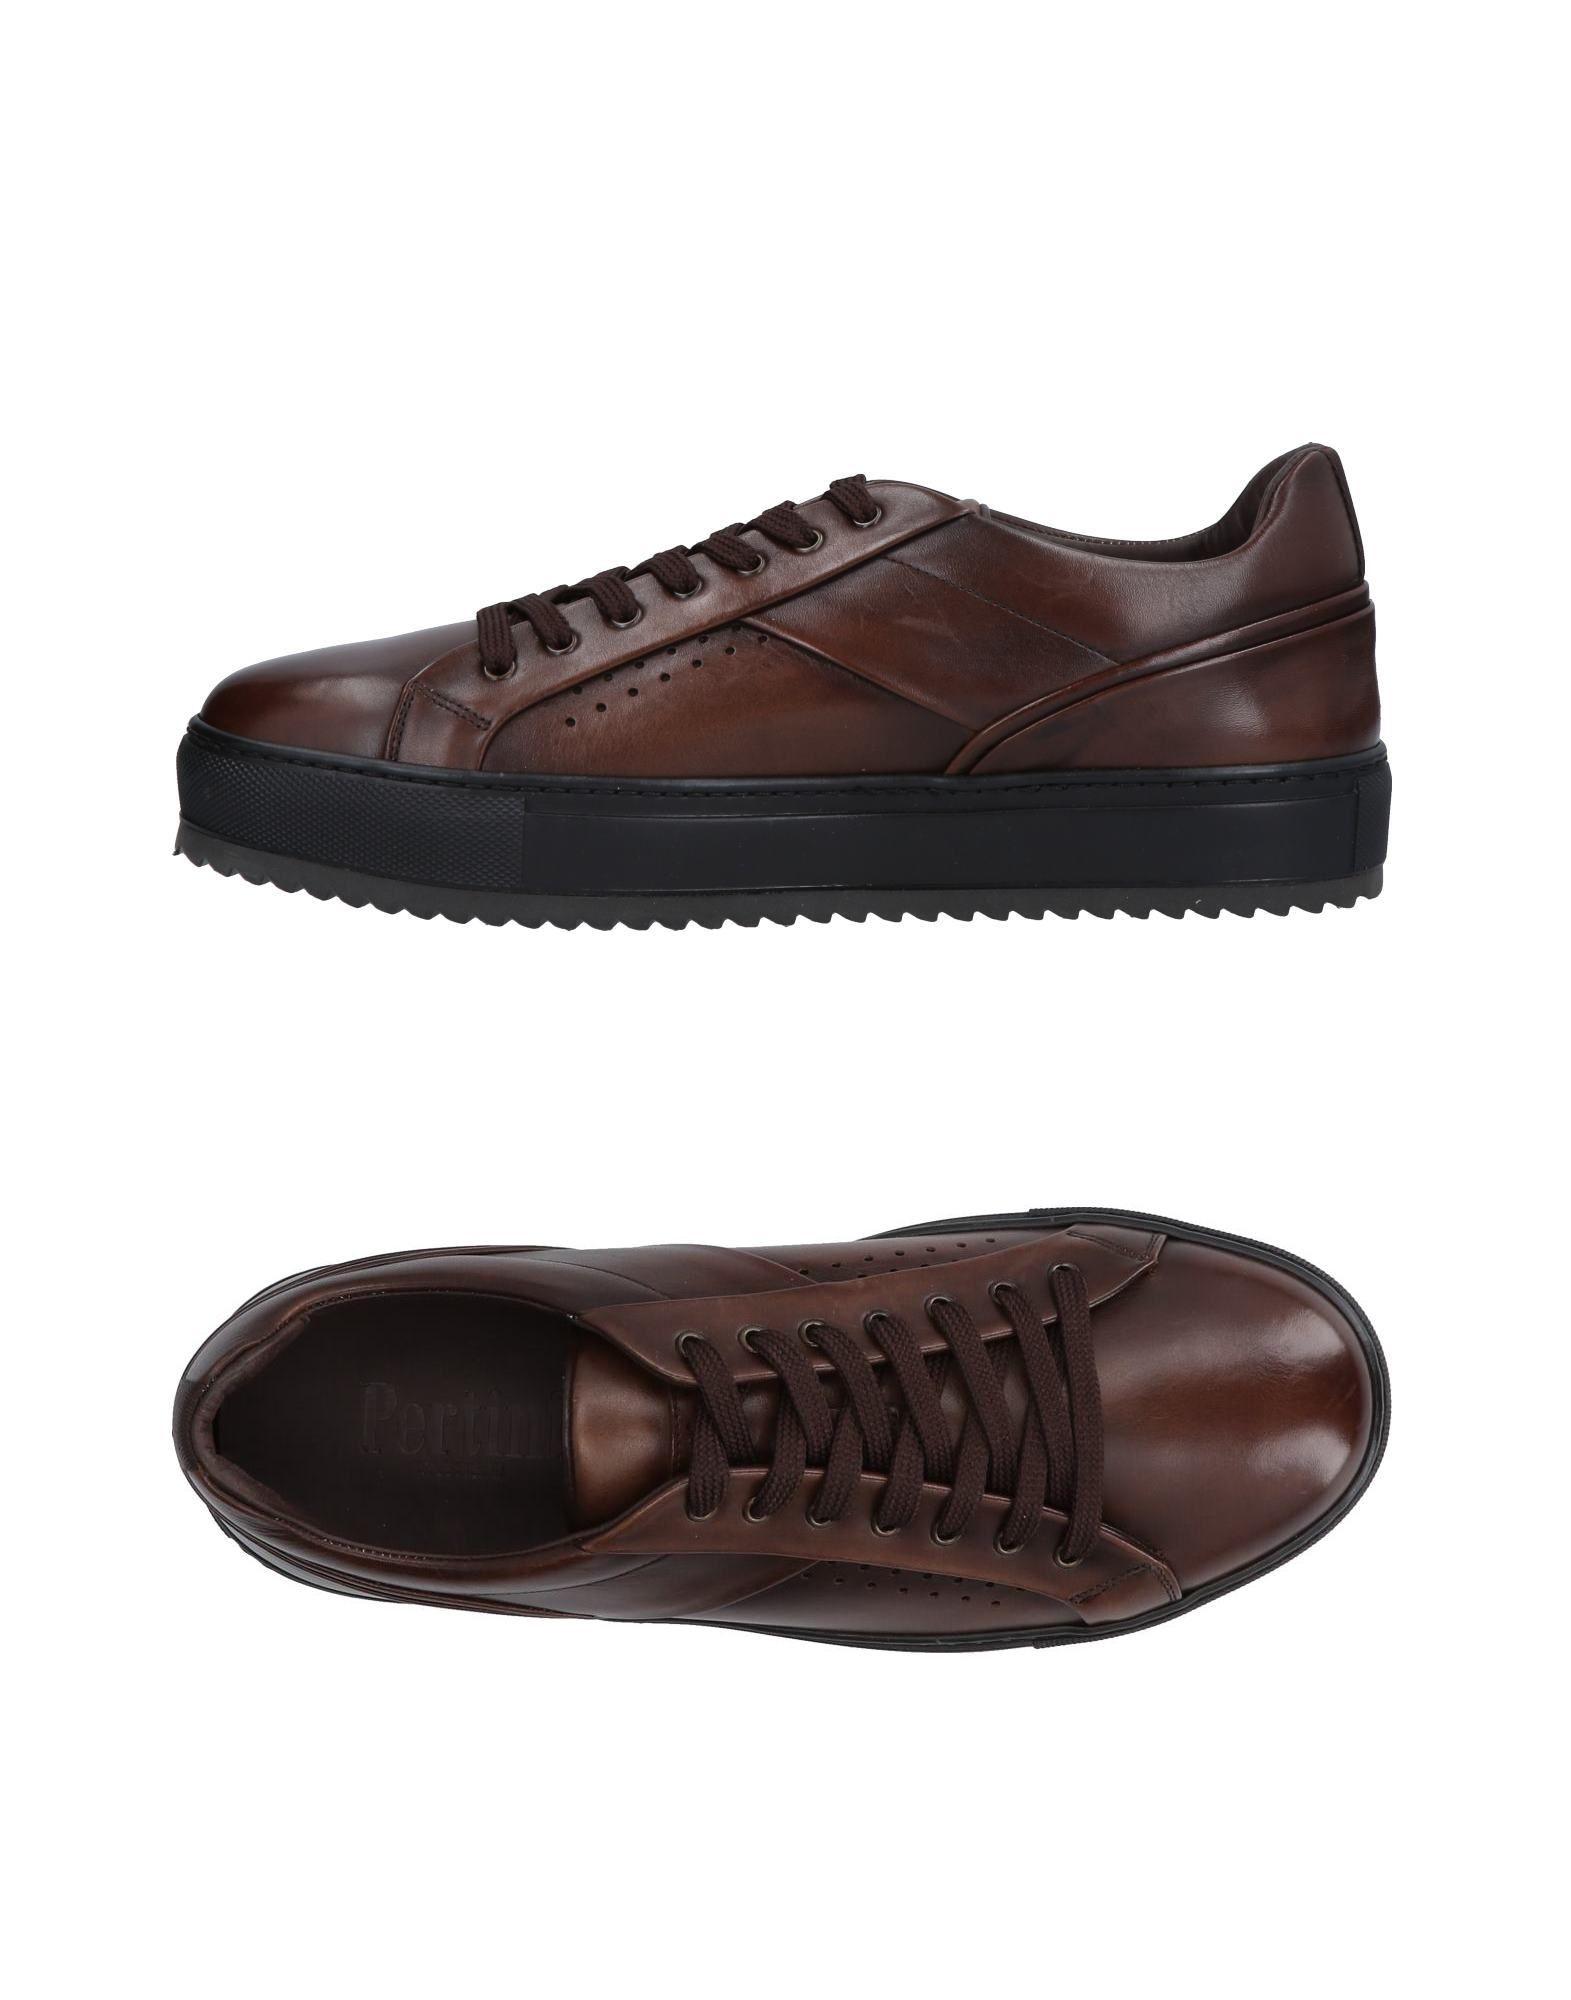 Moda Sneakers Pertini Uomo - 11486253RN